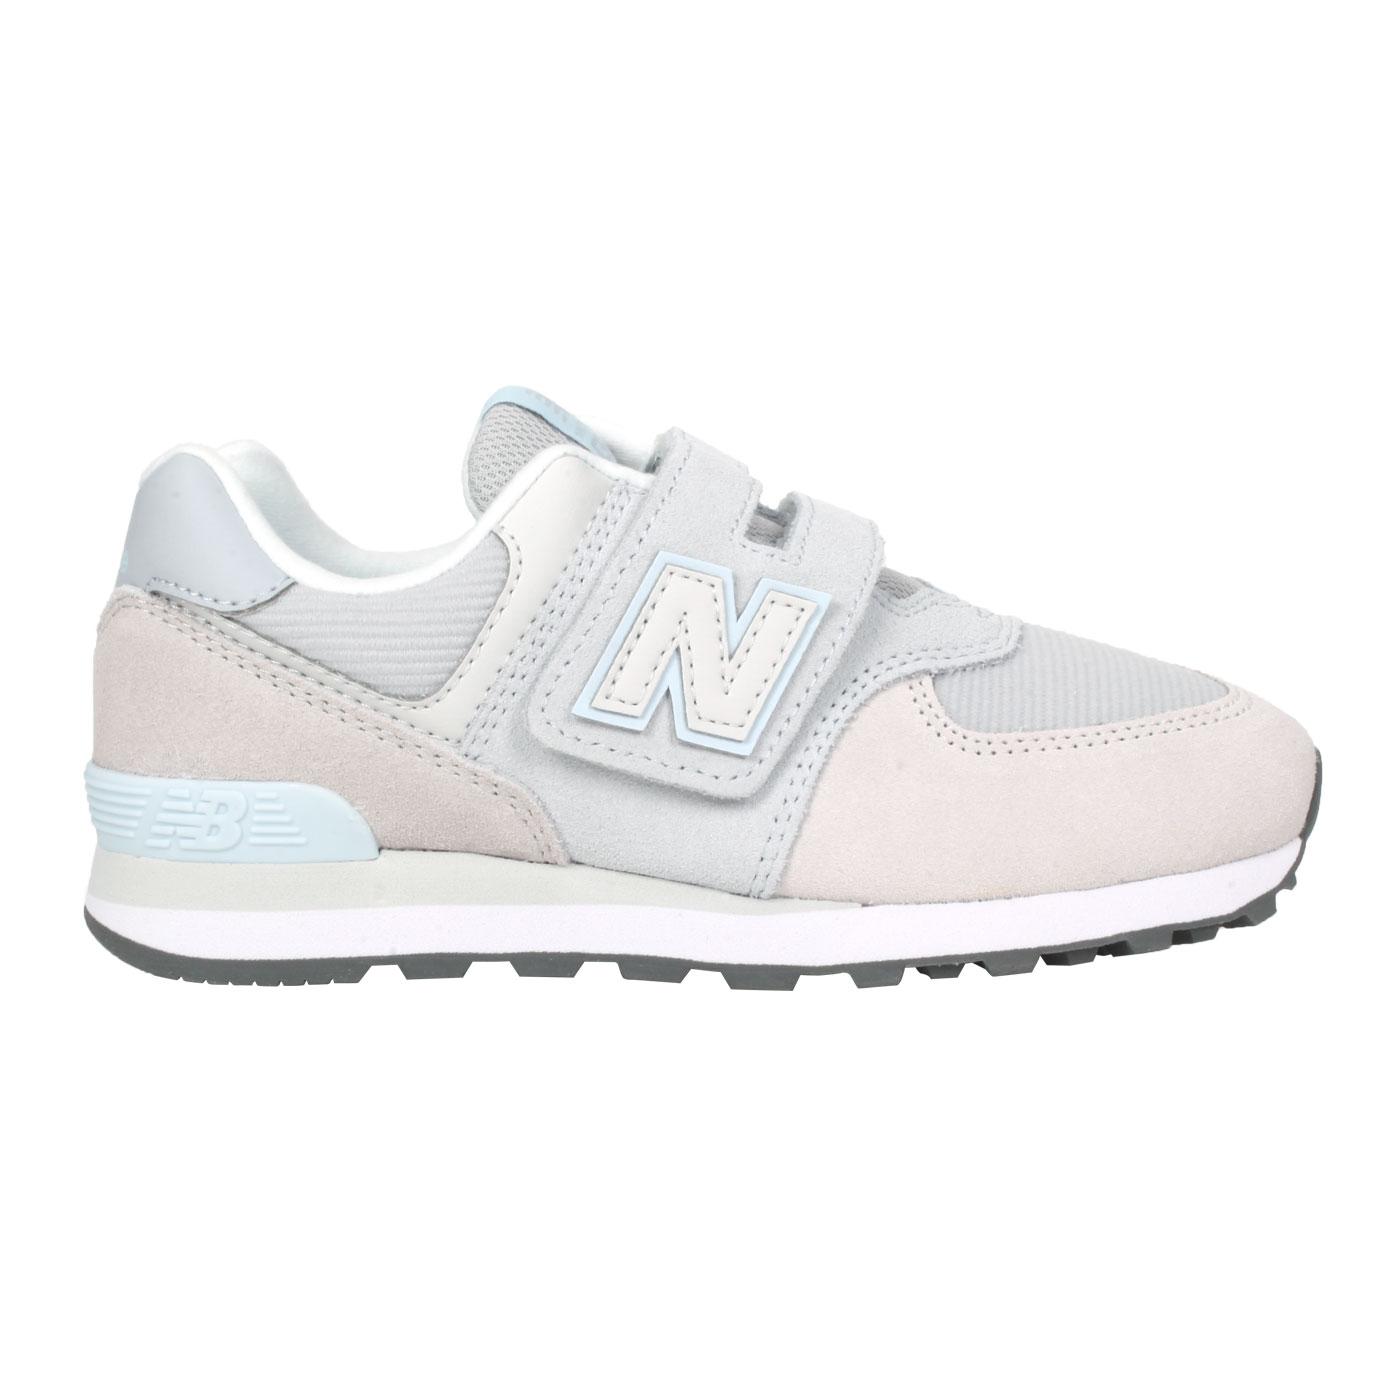 NEW BALANCE 中童休閒運動鞋-WIDE PV574WN1